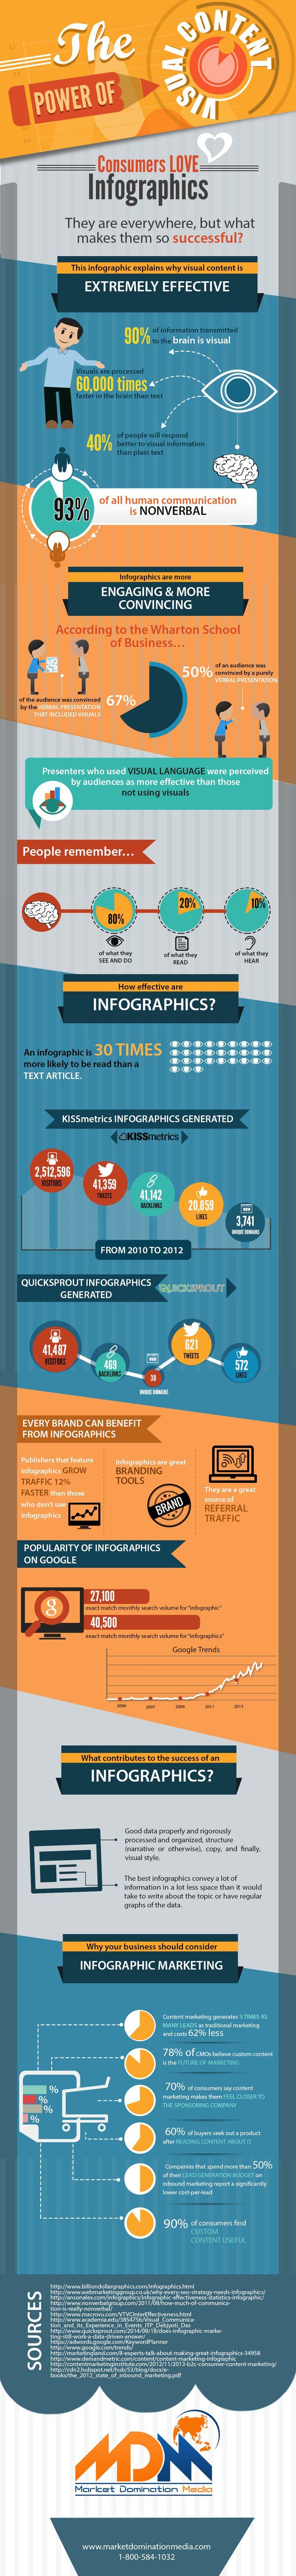 The Power of Visual Content #socialmedia